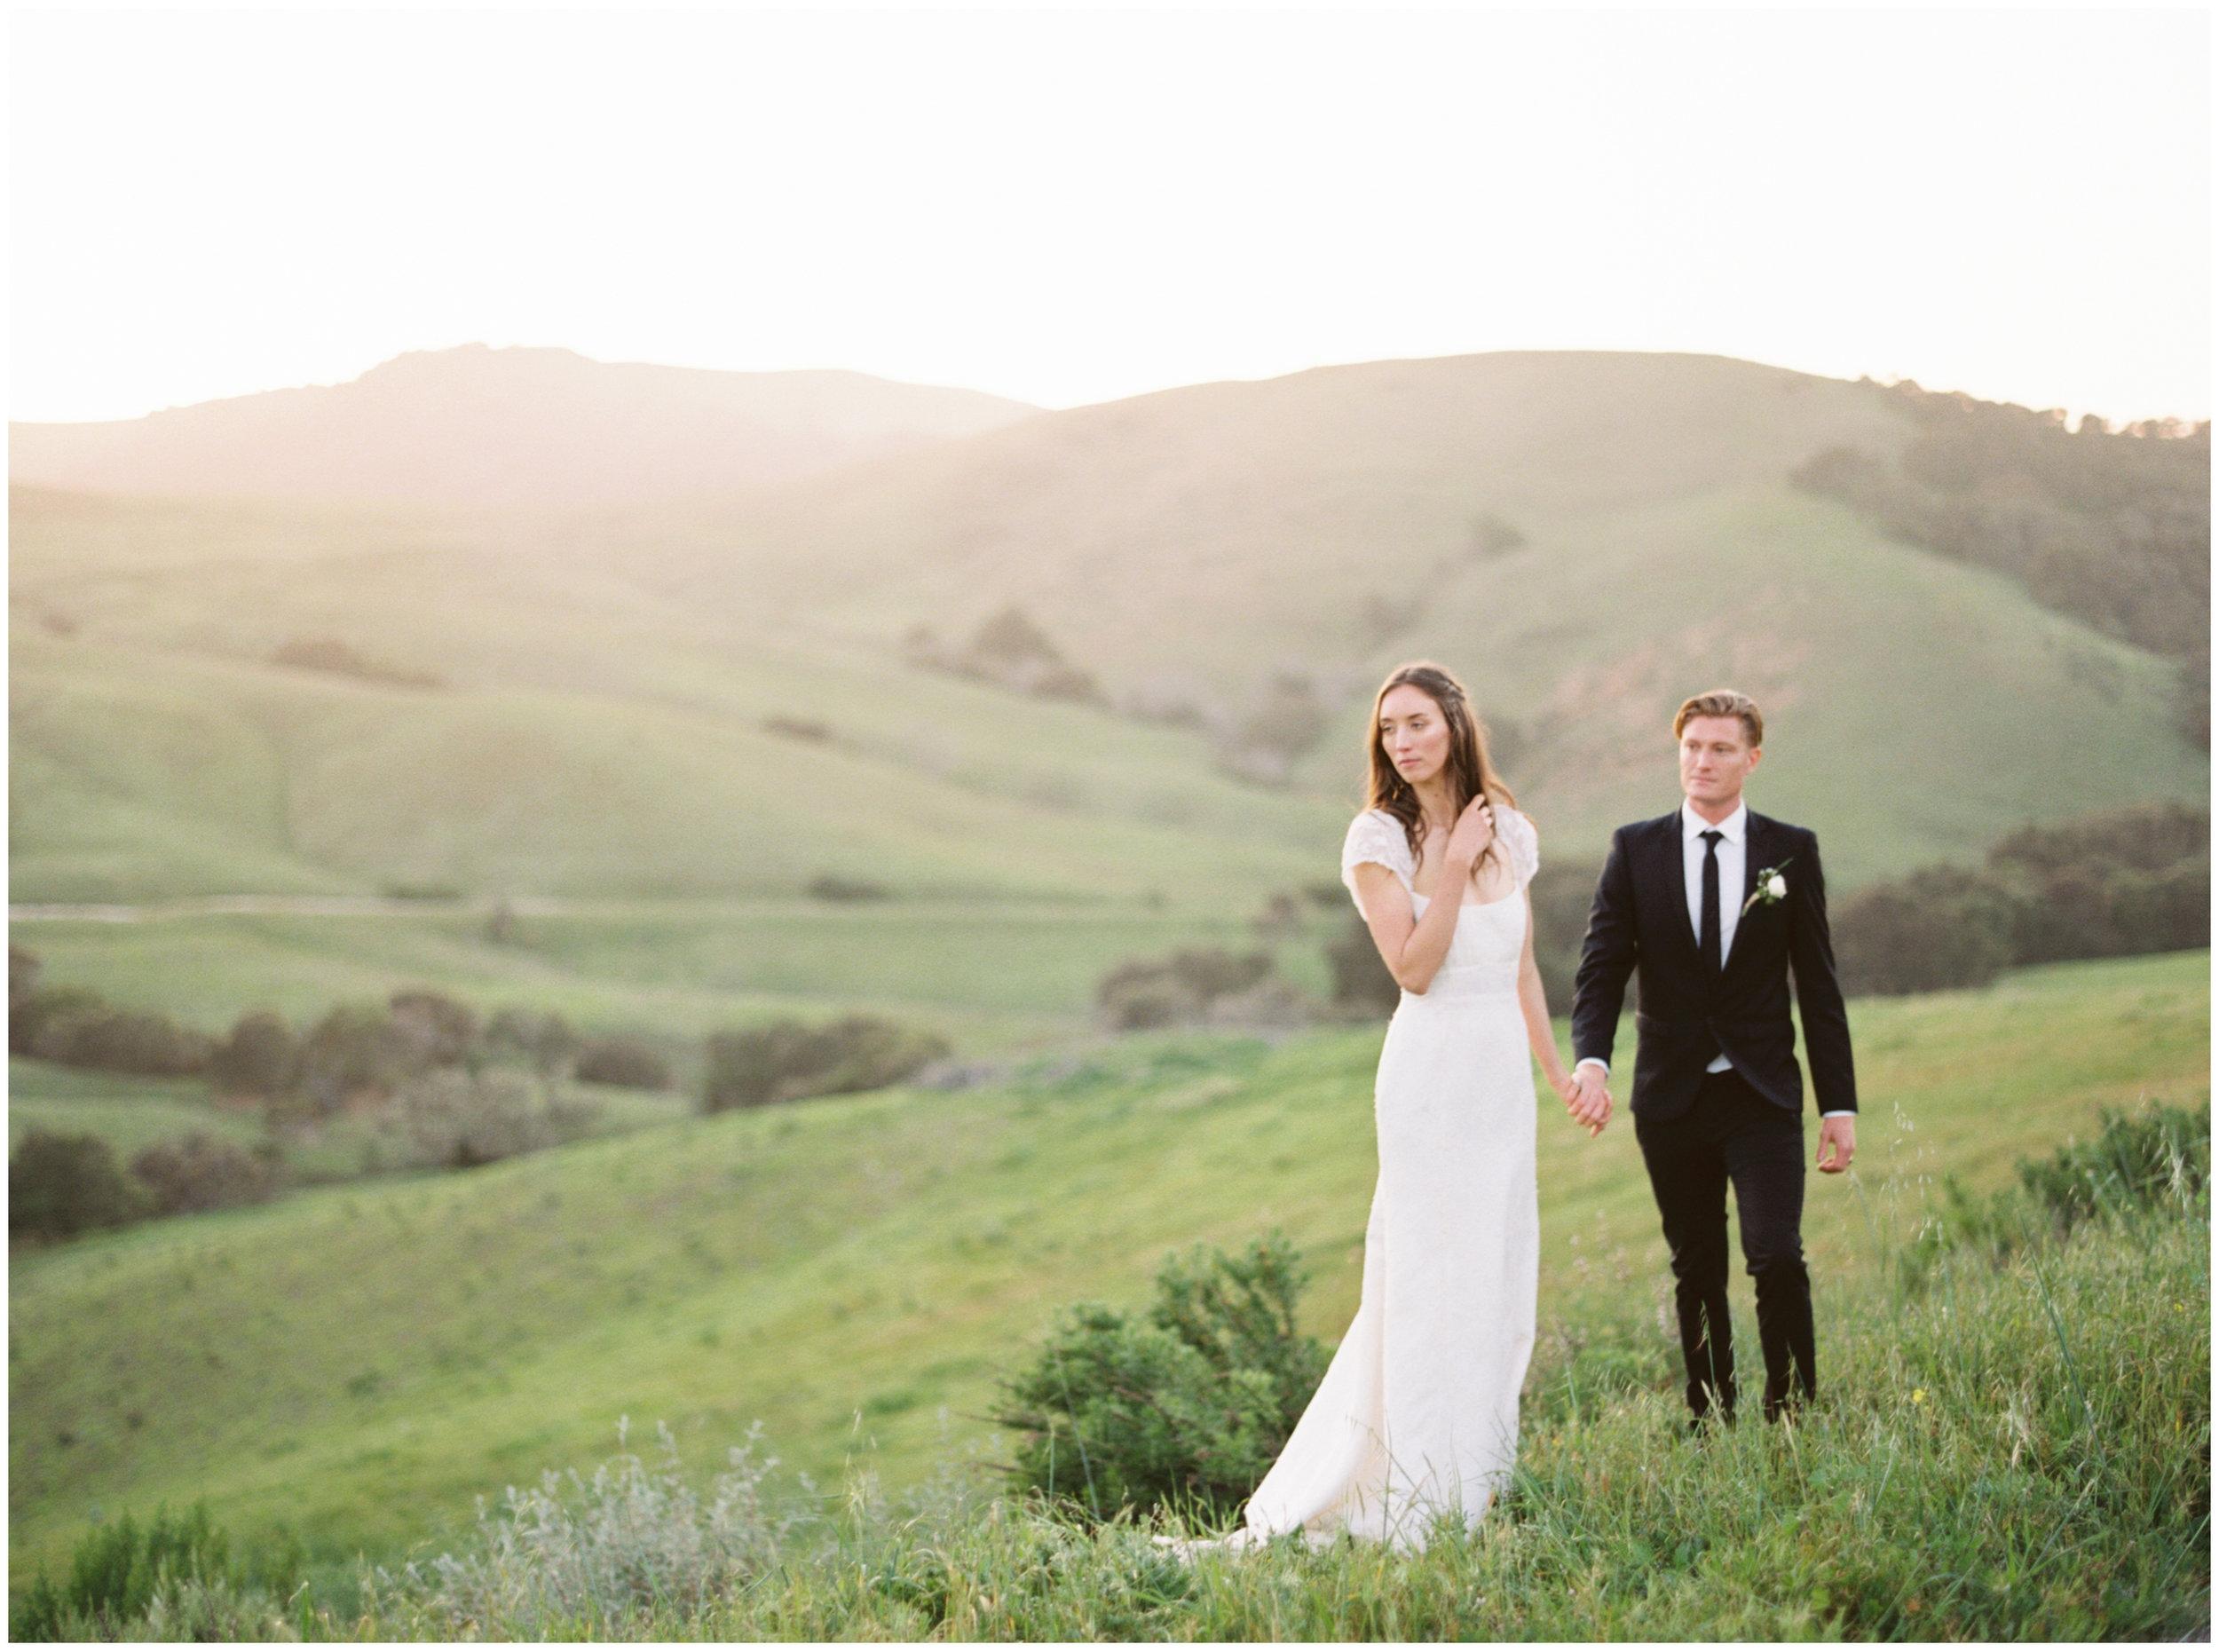 Los_Angeles_Wedding_Photographer_Pinnel_Photography_La_Purisima-5.jpg